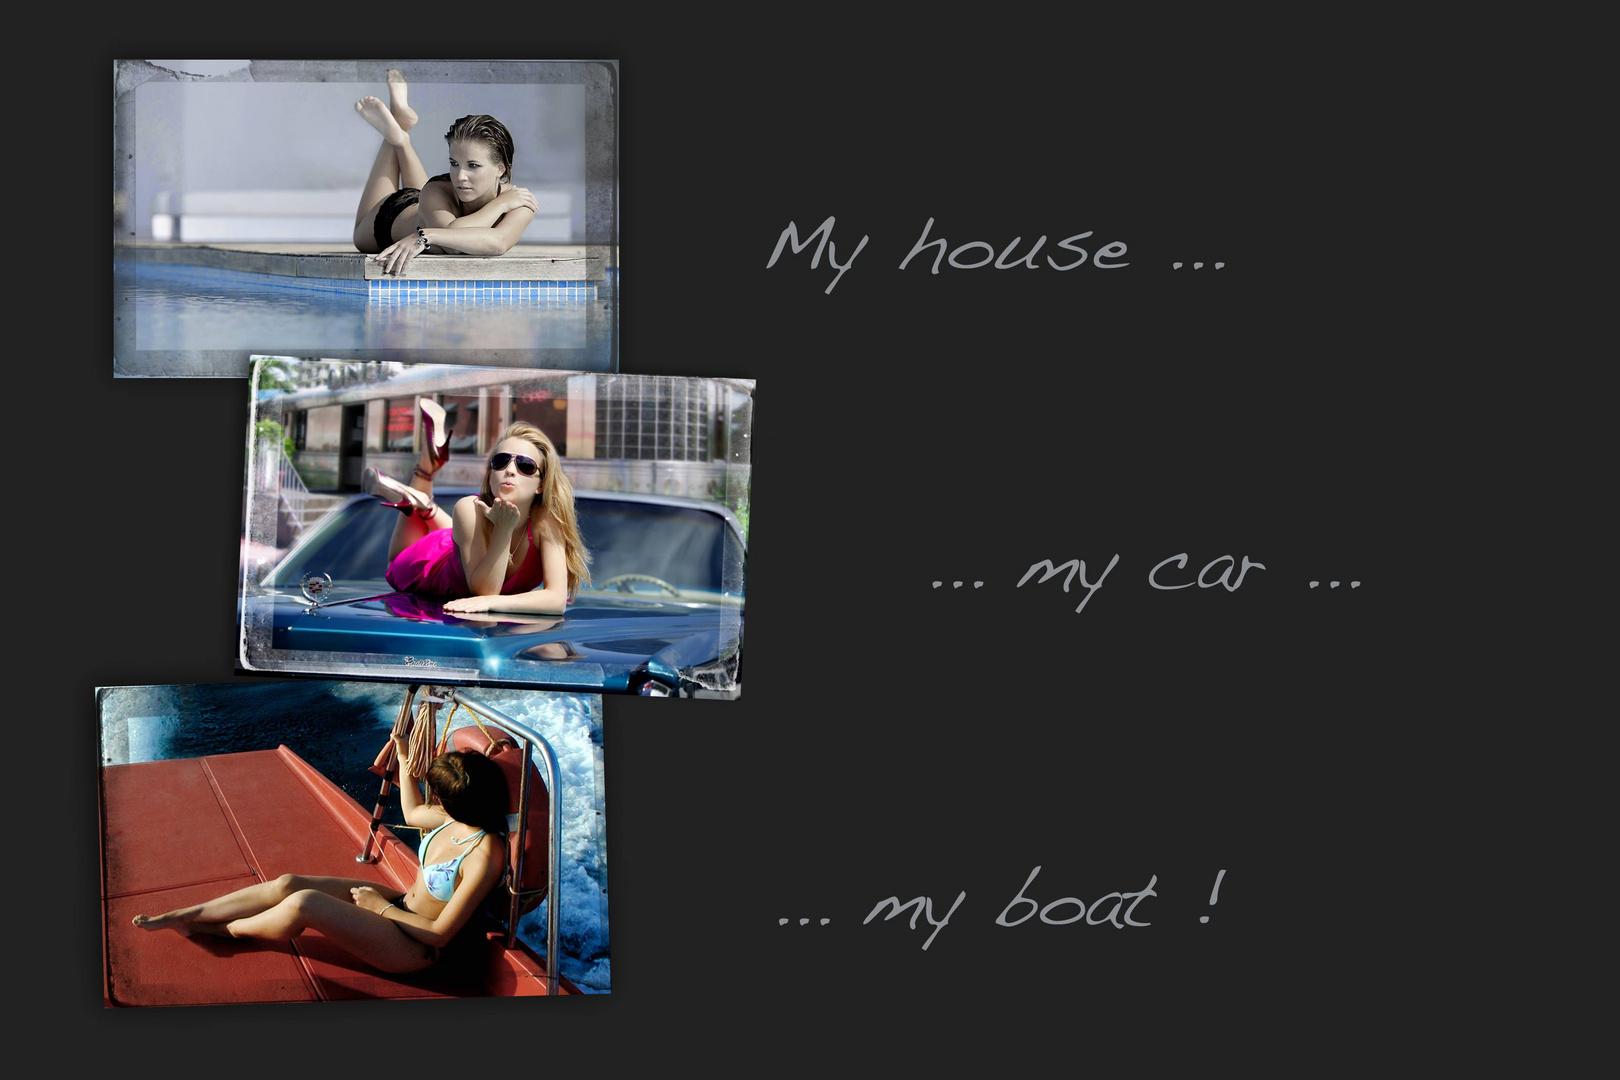 my house, my car, my boat!